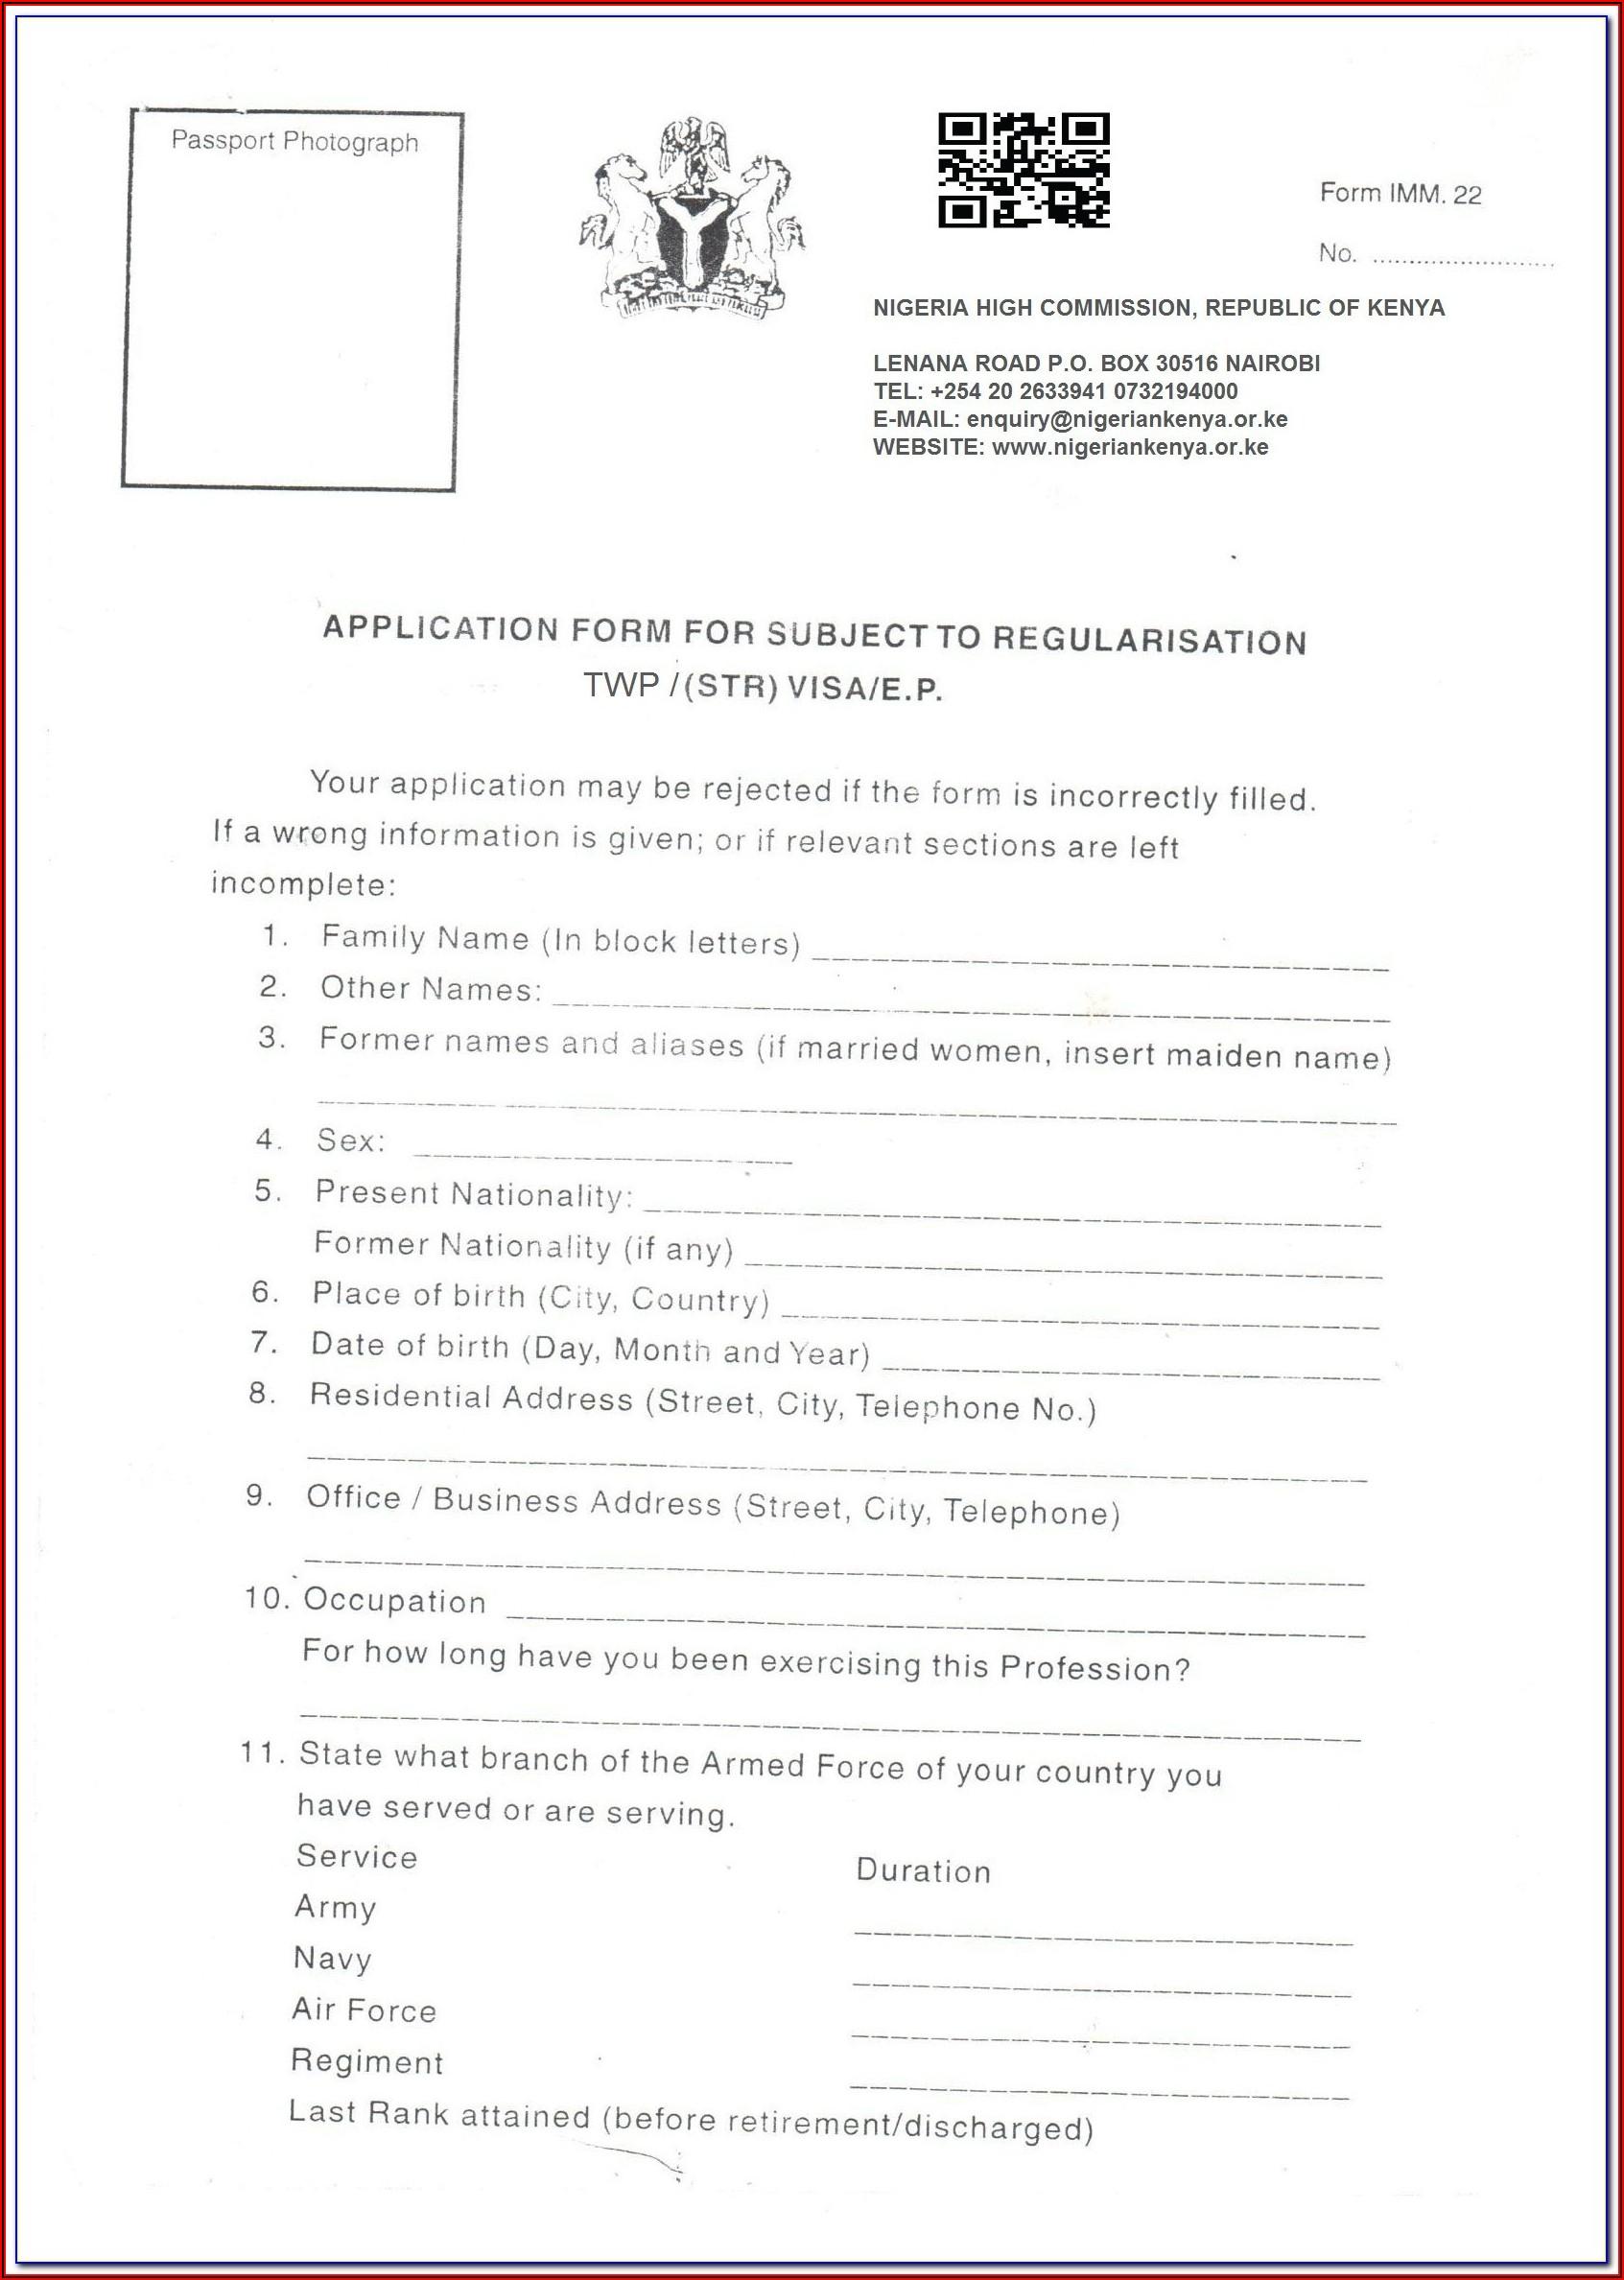 Nigeria Visa Application Form Imm 22